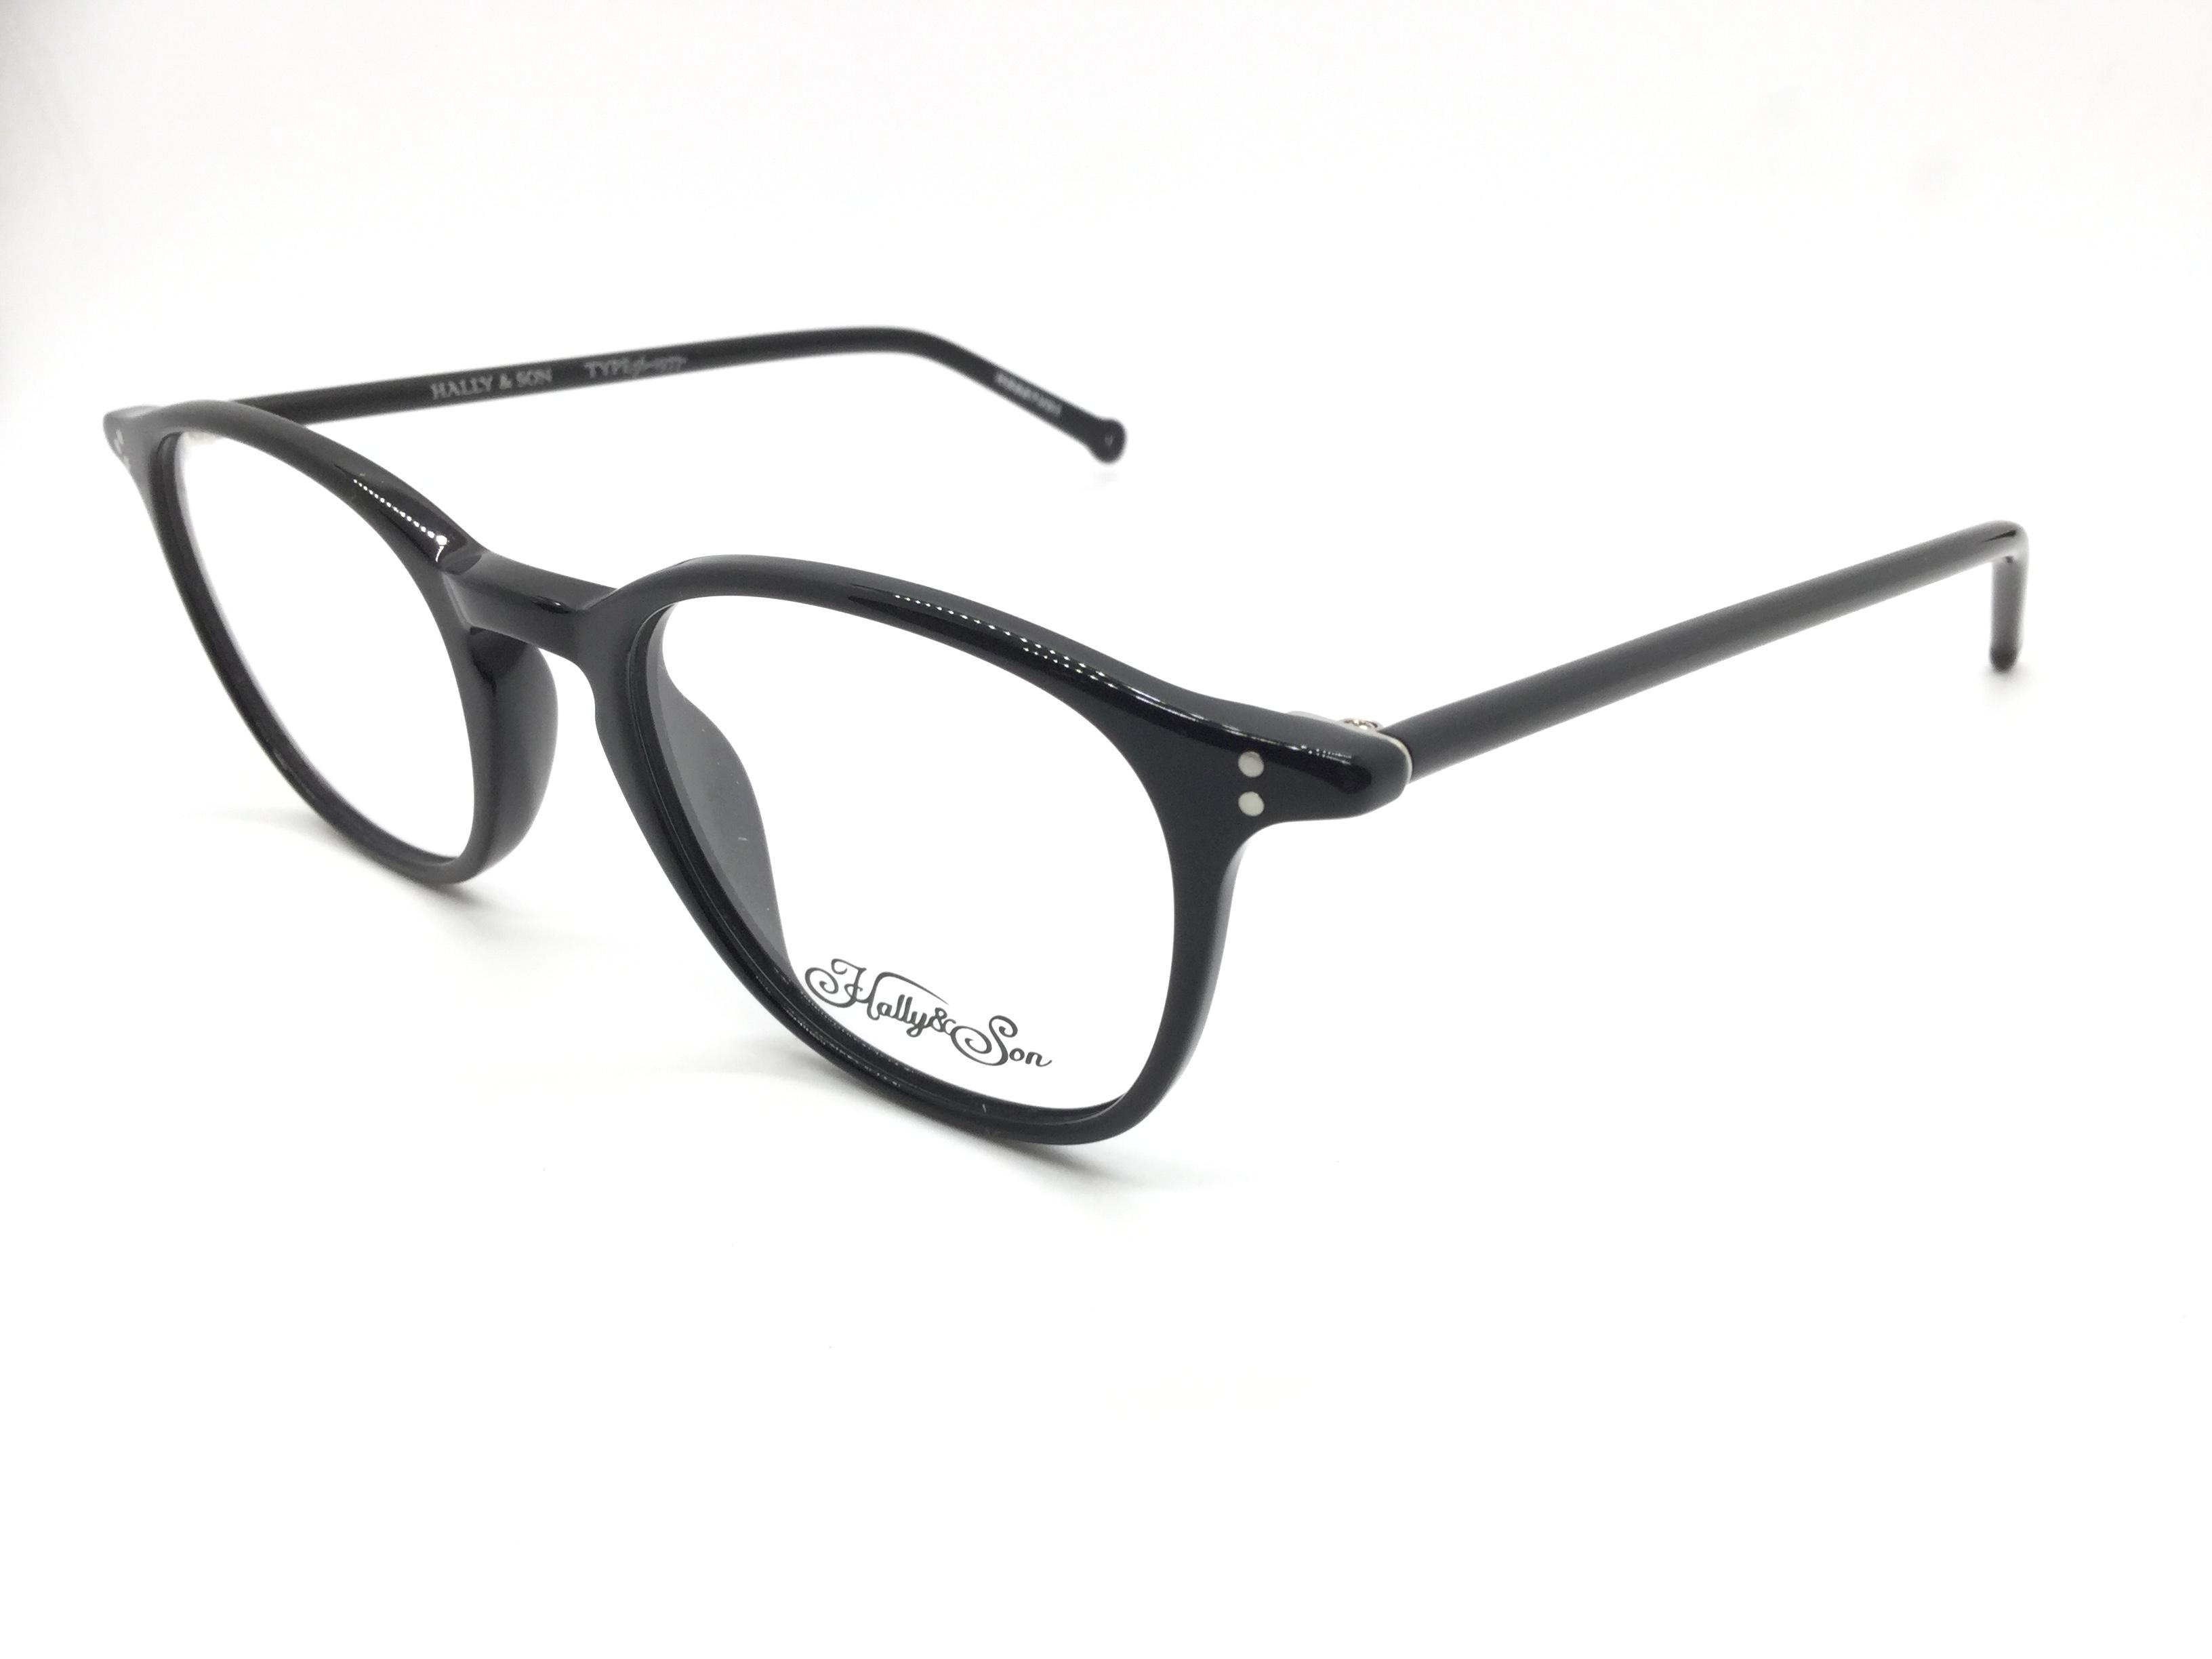 51e5035232e2b Oakley - CROSSLINK ZERO 8076-01 56 16 COL. SATIN GREY SMOKE